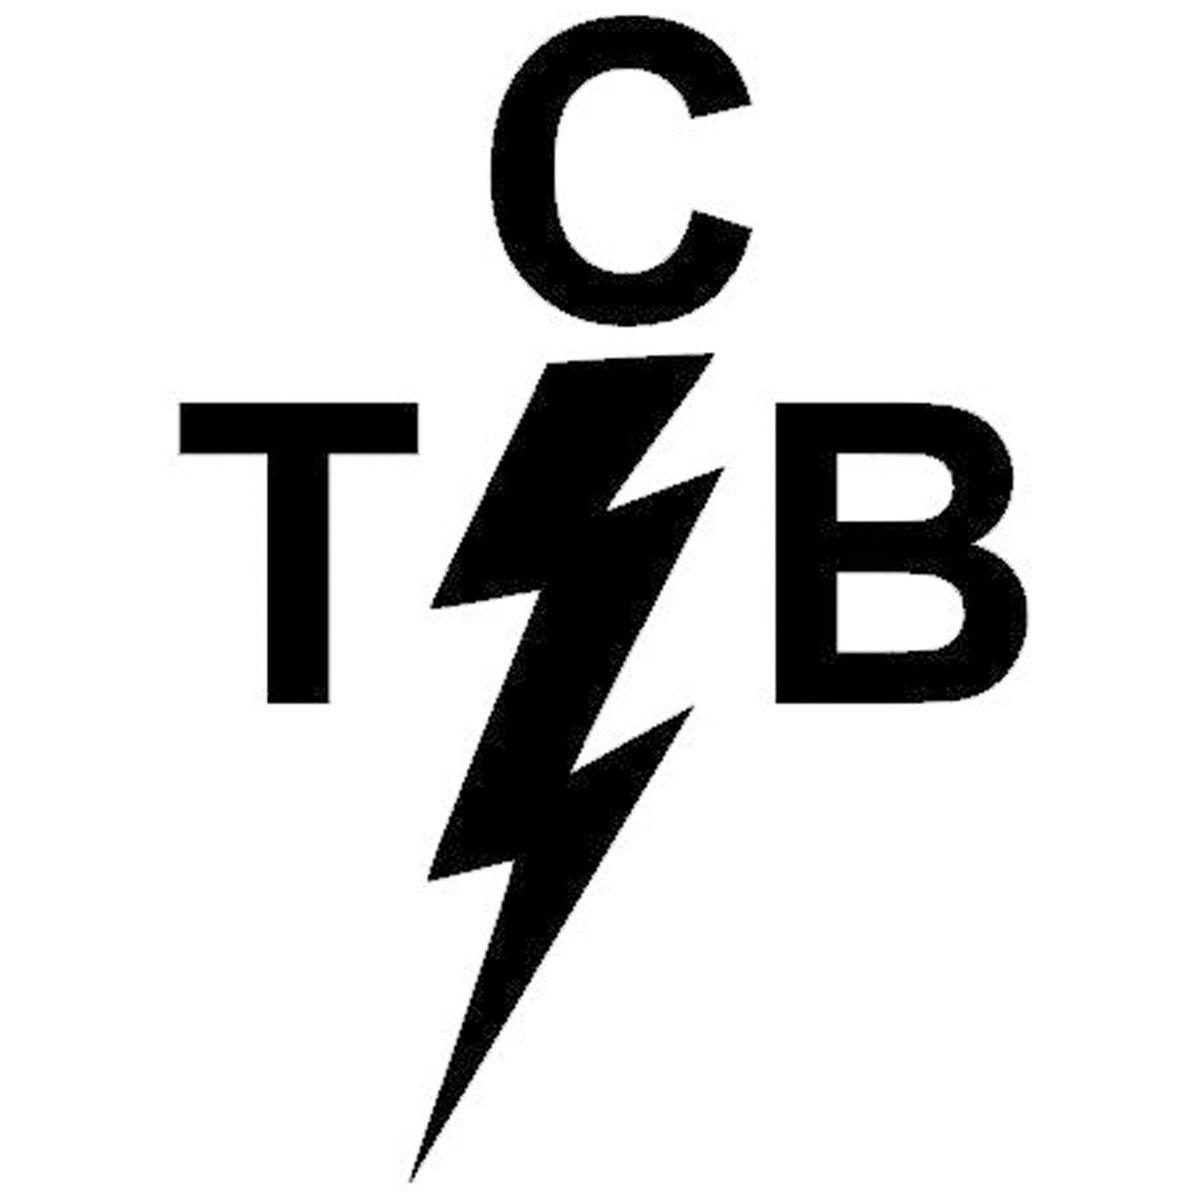 Elvis clipart tcb. Logos